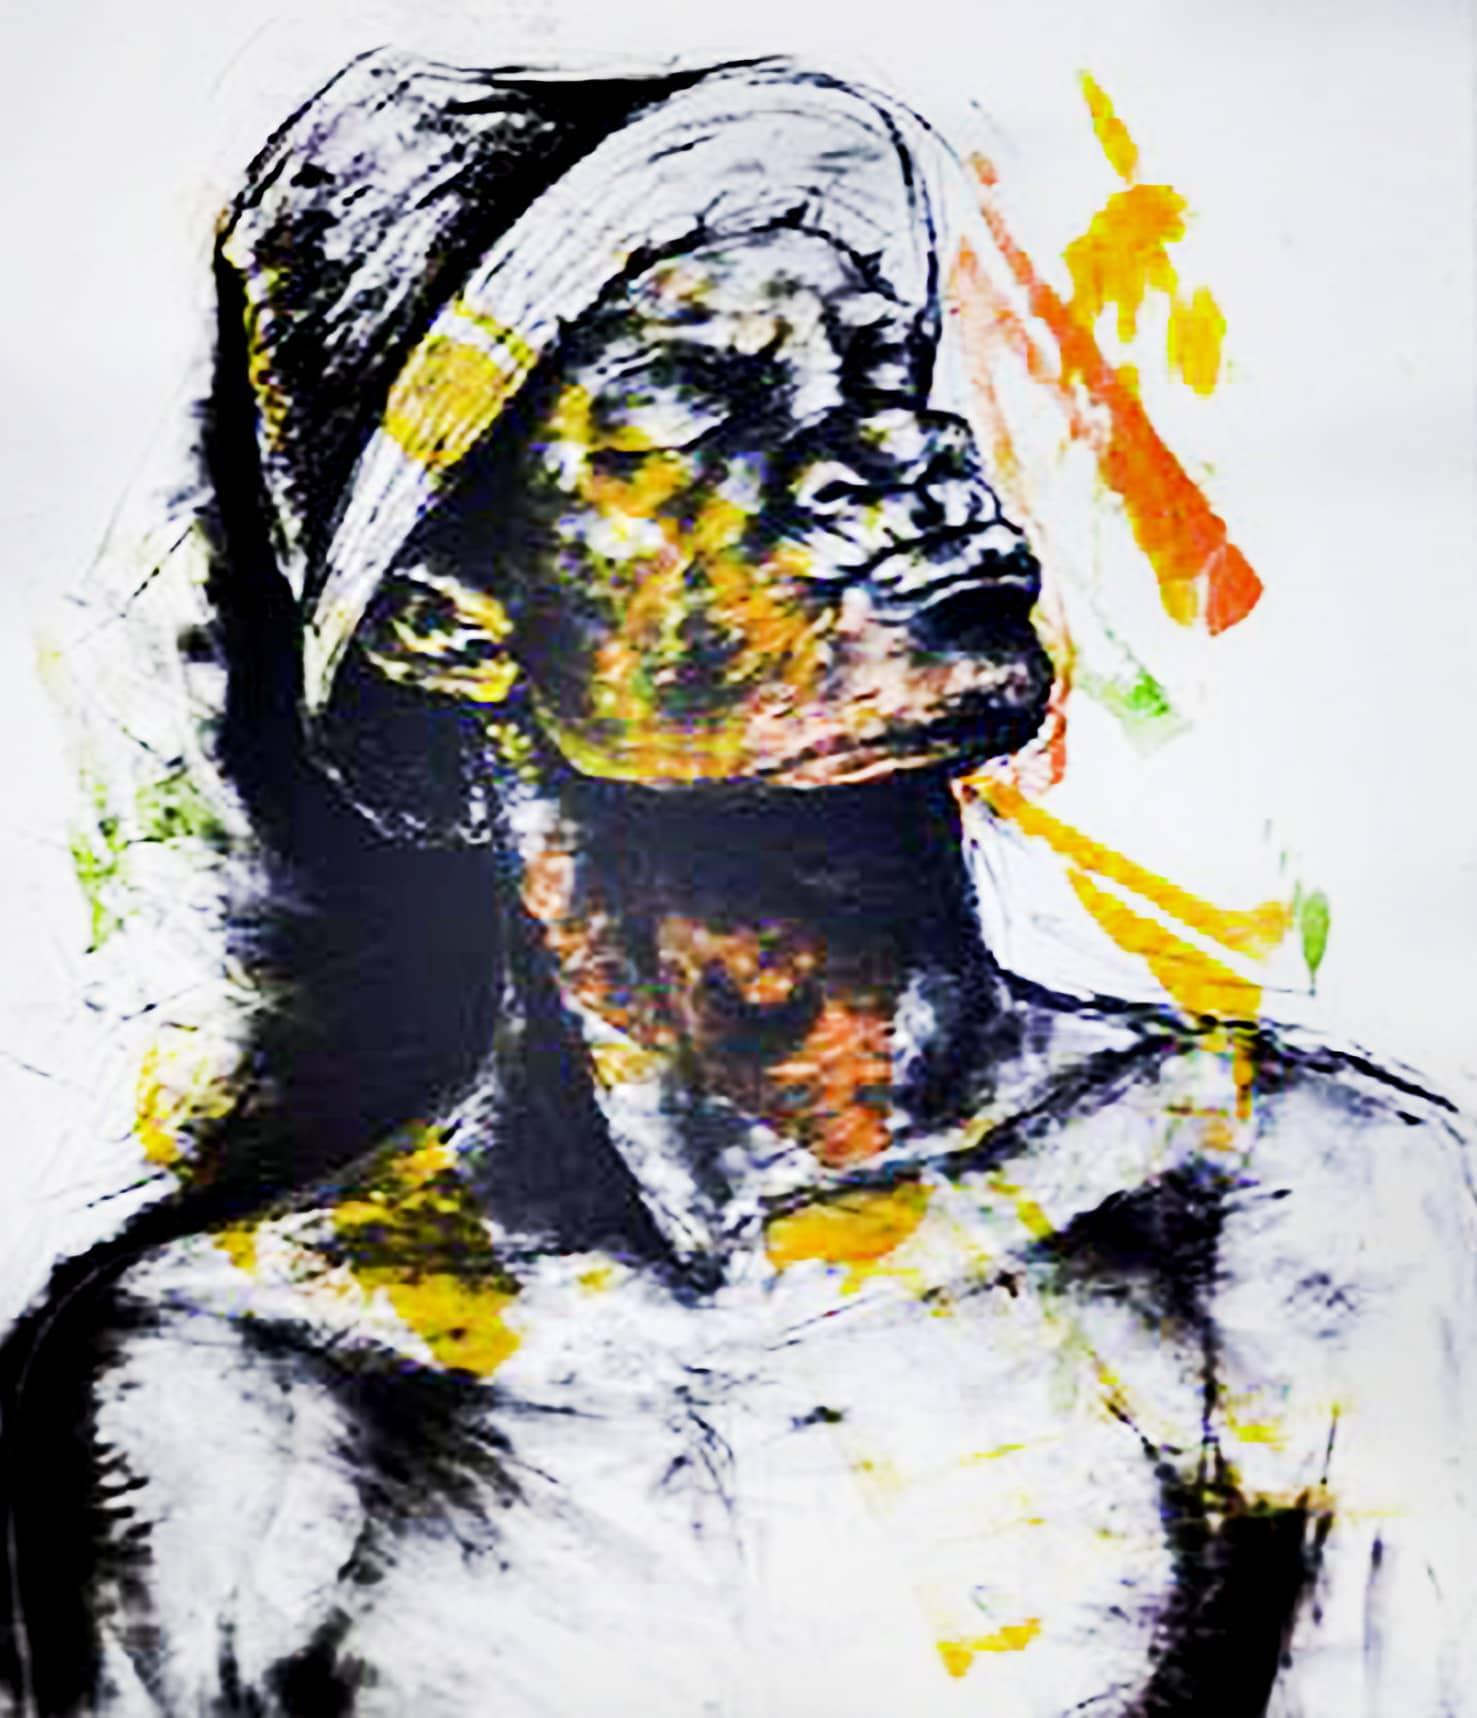 <span class=&#34;link fancybox-details-link&#34;><a href=&#34;/artists/89-mlamuli-mkhwanazi/works/3156-mlamuli-mkhwanazi-soke-sizwe-2015/&#34;>View Detail Page</a></span><div class=&#34;artist&#34;><strong>Mlamuli Mkhwanazi</strong></div> <div class=&#34;title&#34;><em>Soke-Sizwe</em>, 2015</div> <div class=&#34;medium&#34;>Charcoal & Ink On Paper</div> <div class=&#34;dimensions&#34;>92cm x 83cm</div><div class=&#34;price&#34;>R9,200.00</div>